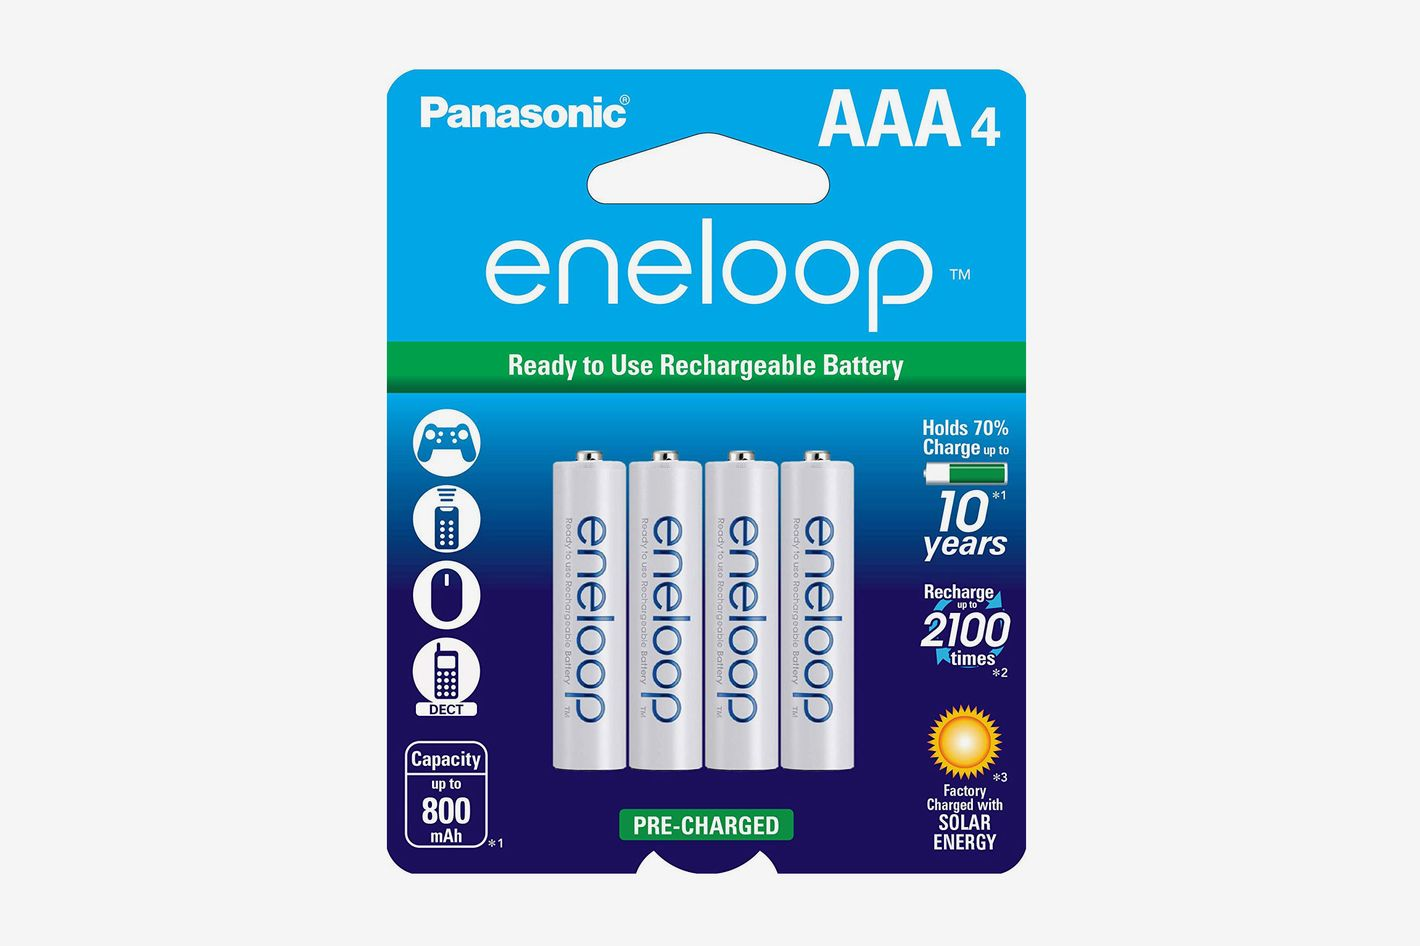 Panasonic Eneloop AAA Pre-Charged Rechargeable Batteries (4-Pack)